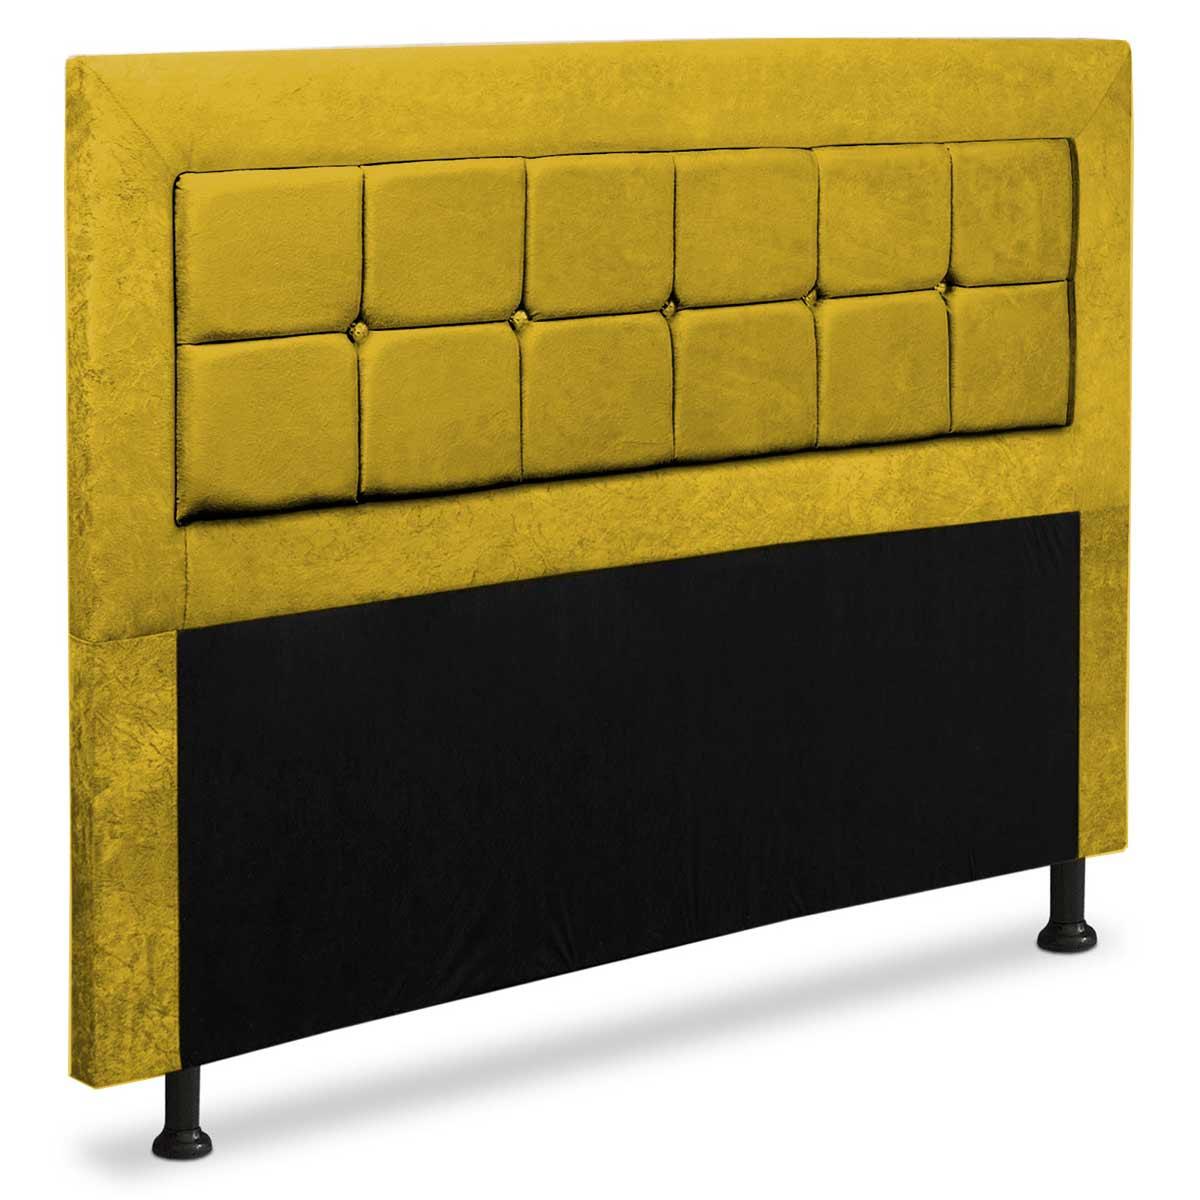 Cabeceira Queen Estofada Rússia 160 cm Animale Amarelo